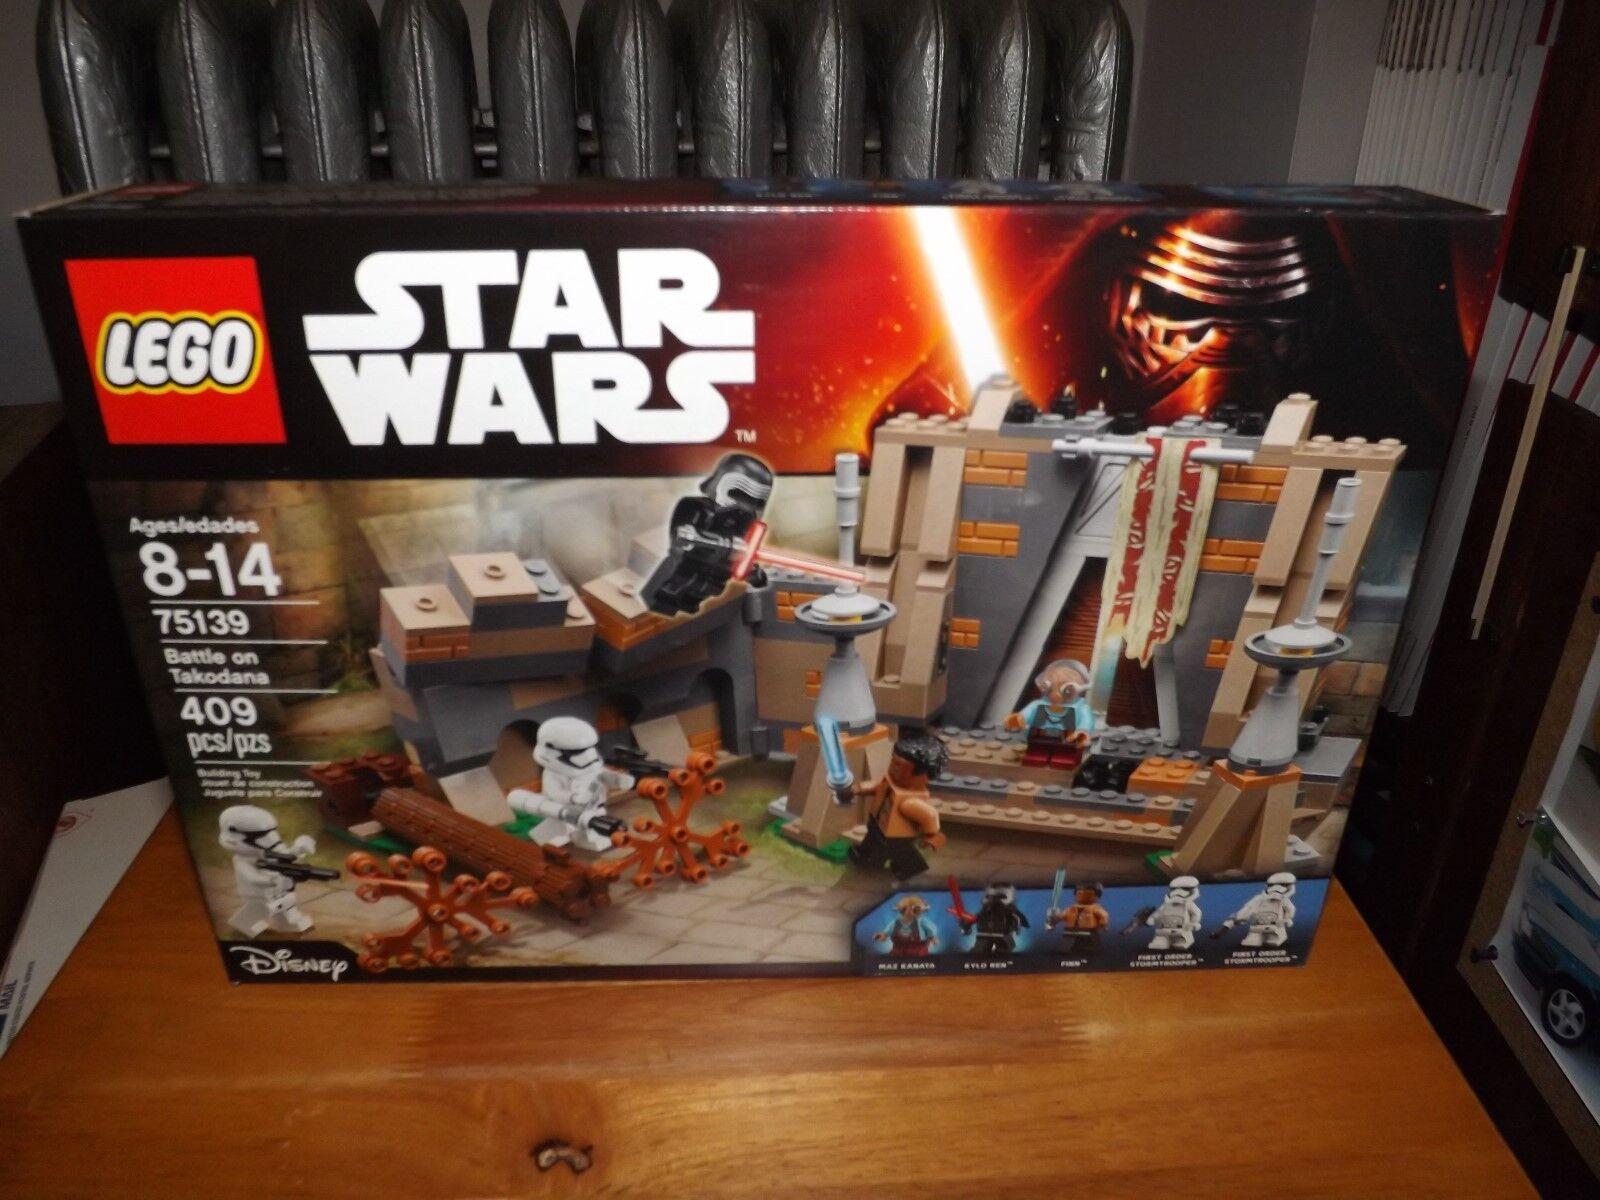 LEGO, STAR WARS, BATTLE ON TAKODANA, KIT  75139, 409 PIECES, NEW IN BOX, 2016